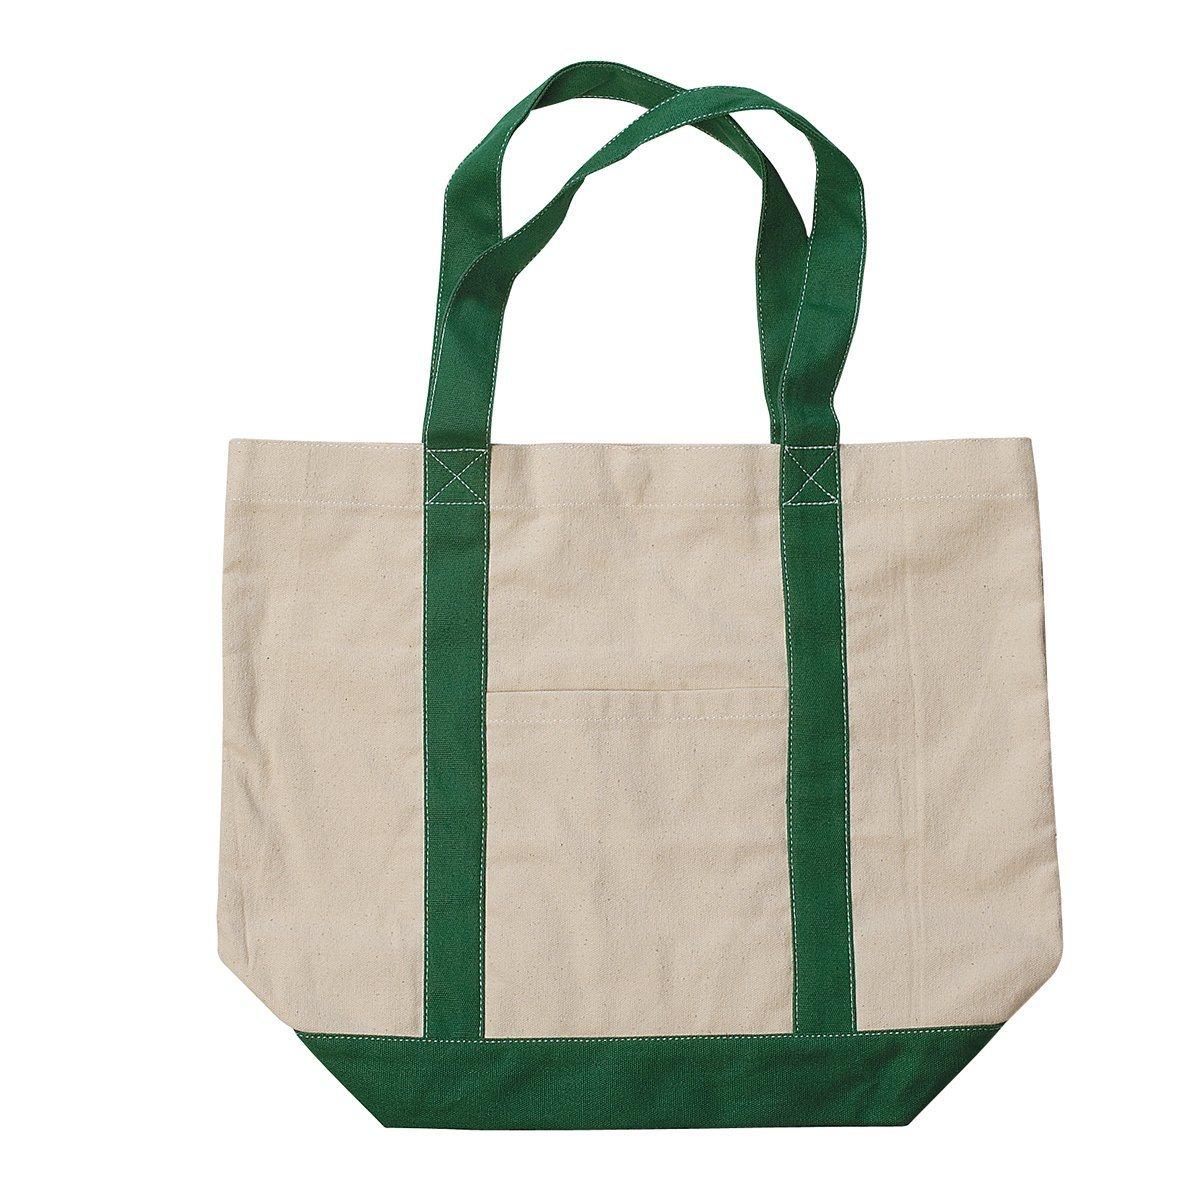 Promotional Bag Cavans Shopping Travel Bags Diaper Bags